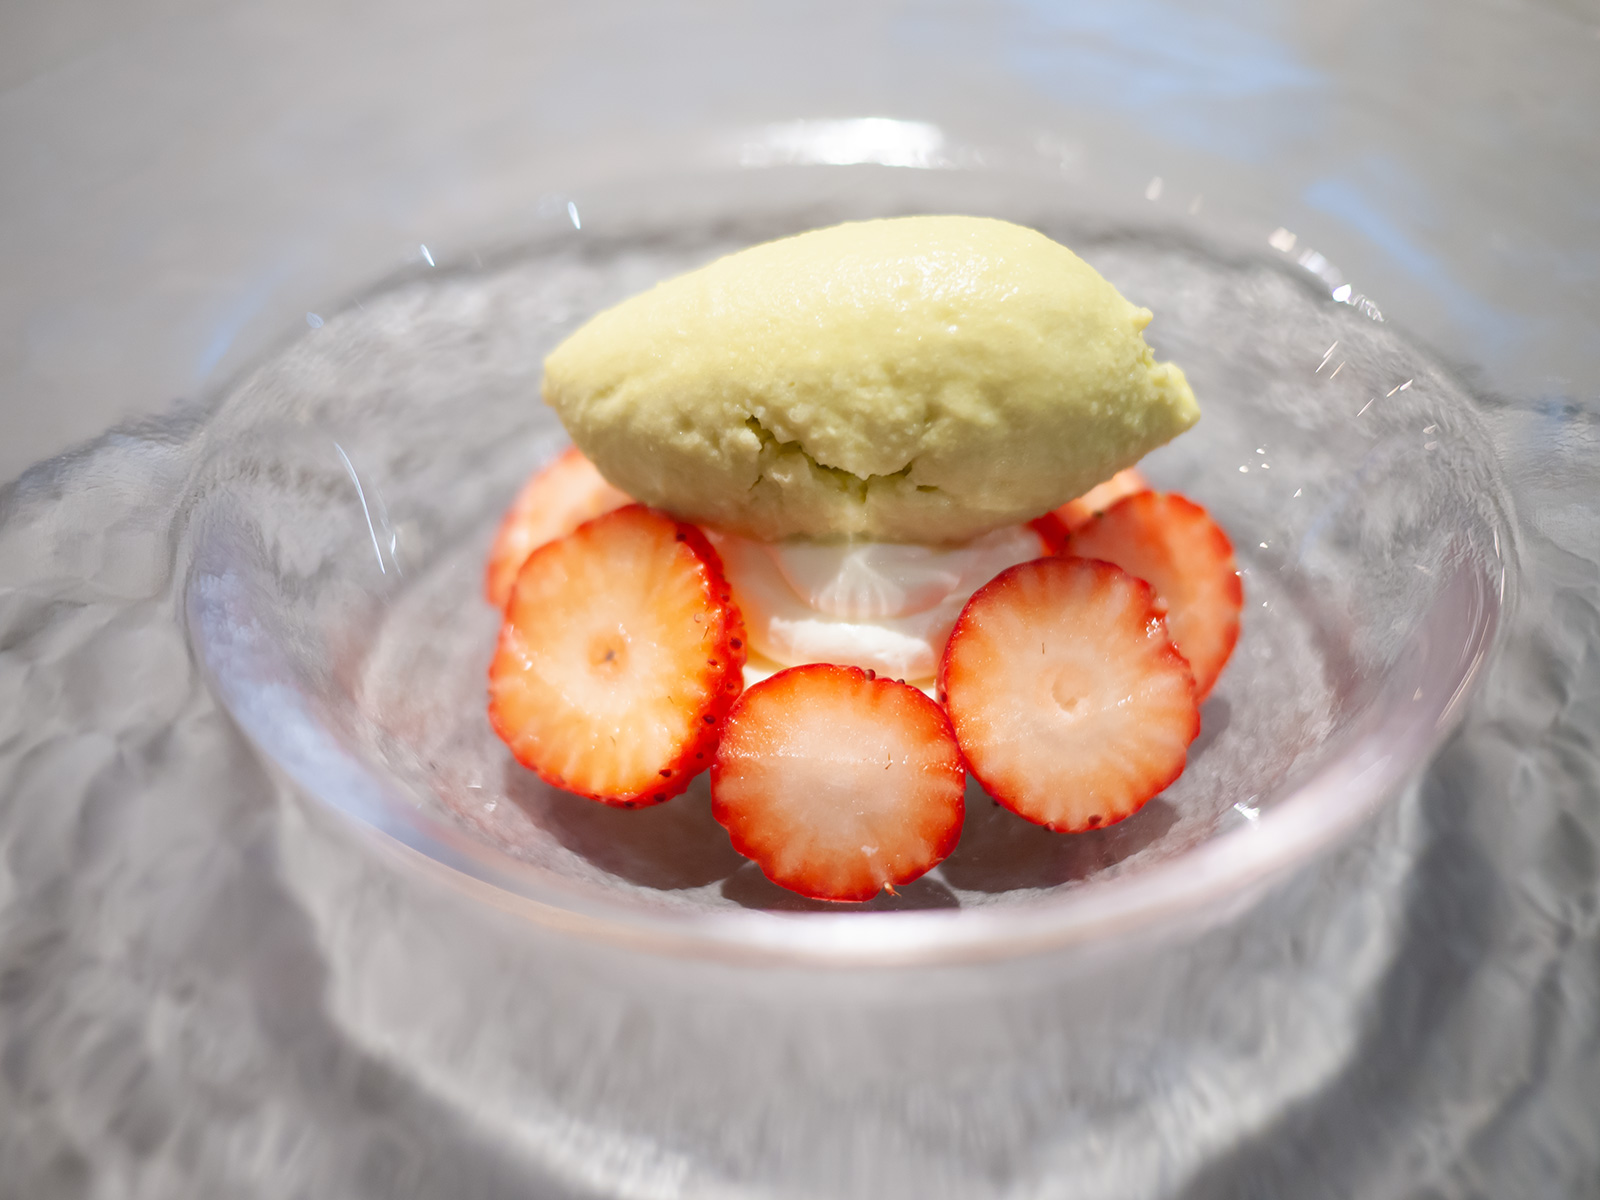 Nagano Suzuakane Strawberry and Pistacchio